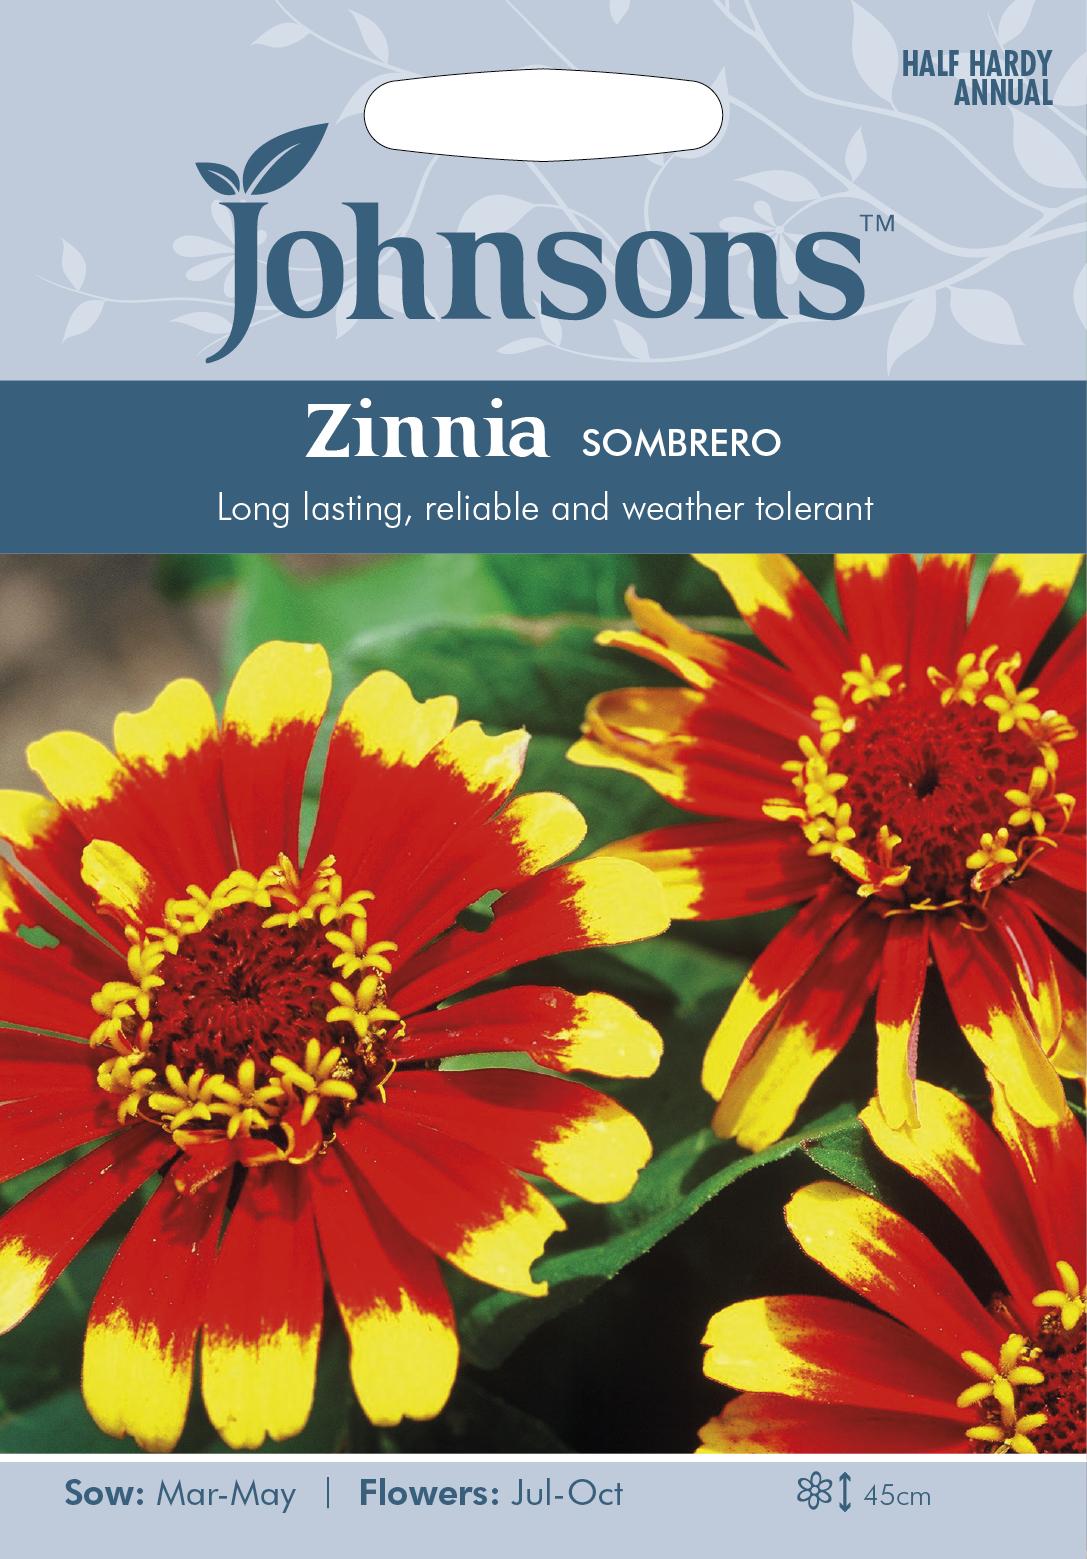 Zinnia 'Sombrero